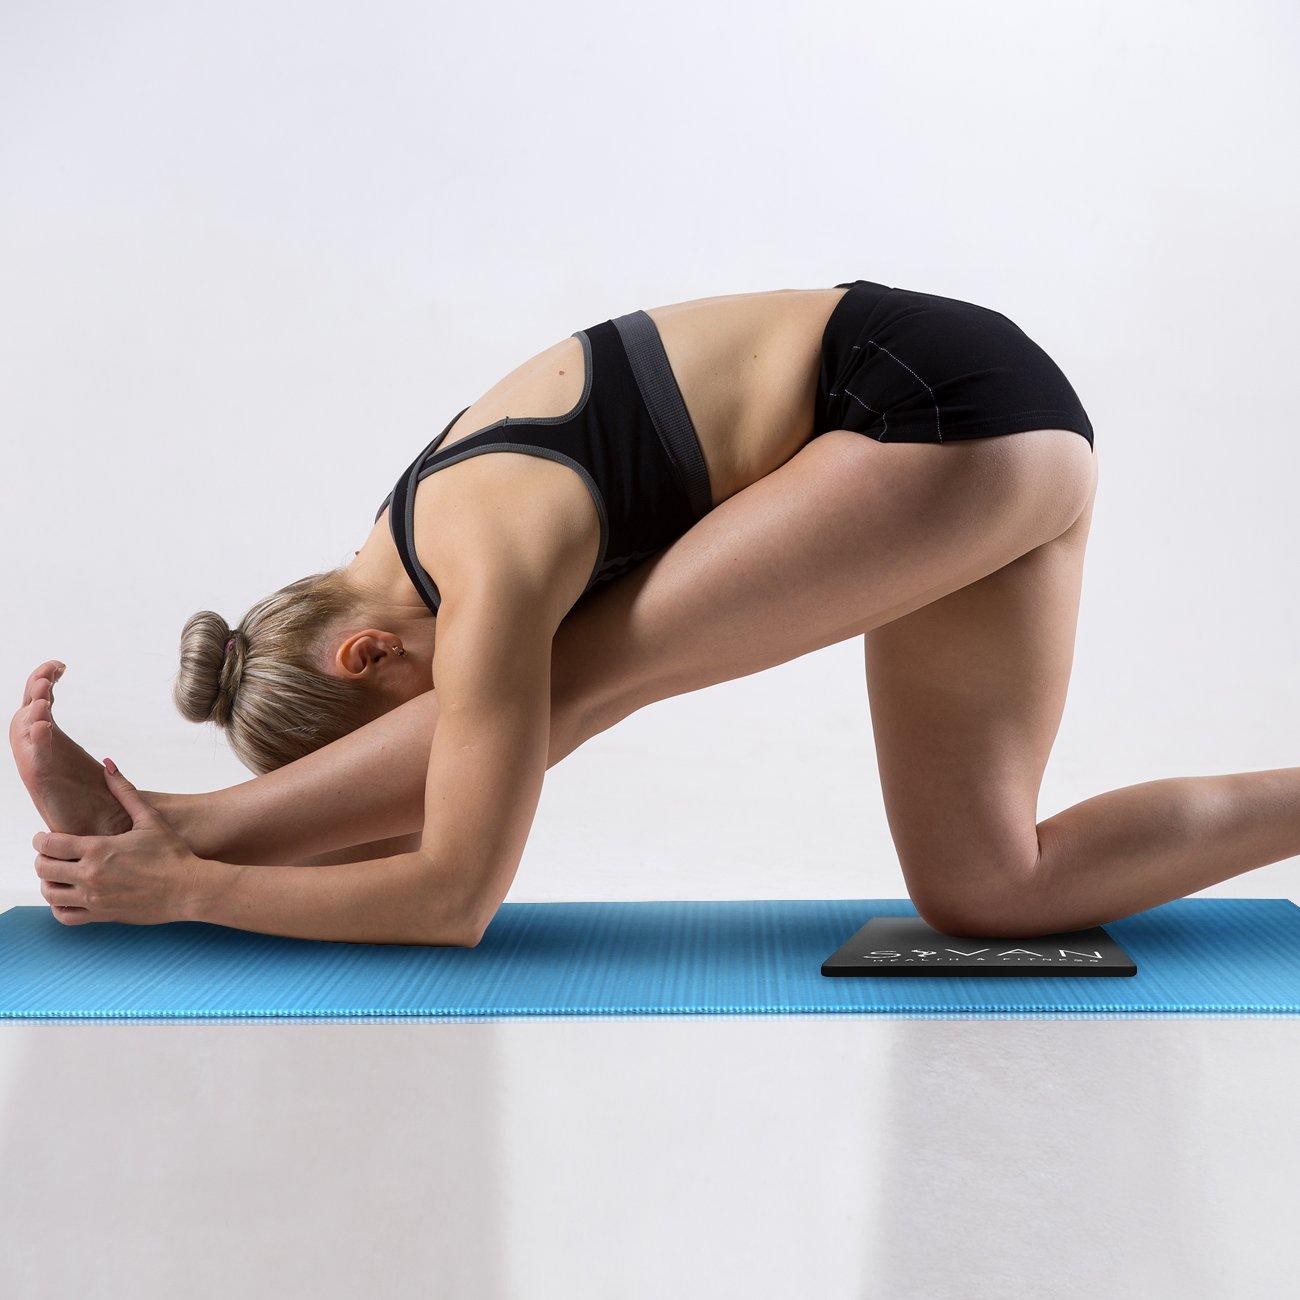 Amazon.com: Sivan Salud y Fitness Yoga Rodillera Almohadilla ...